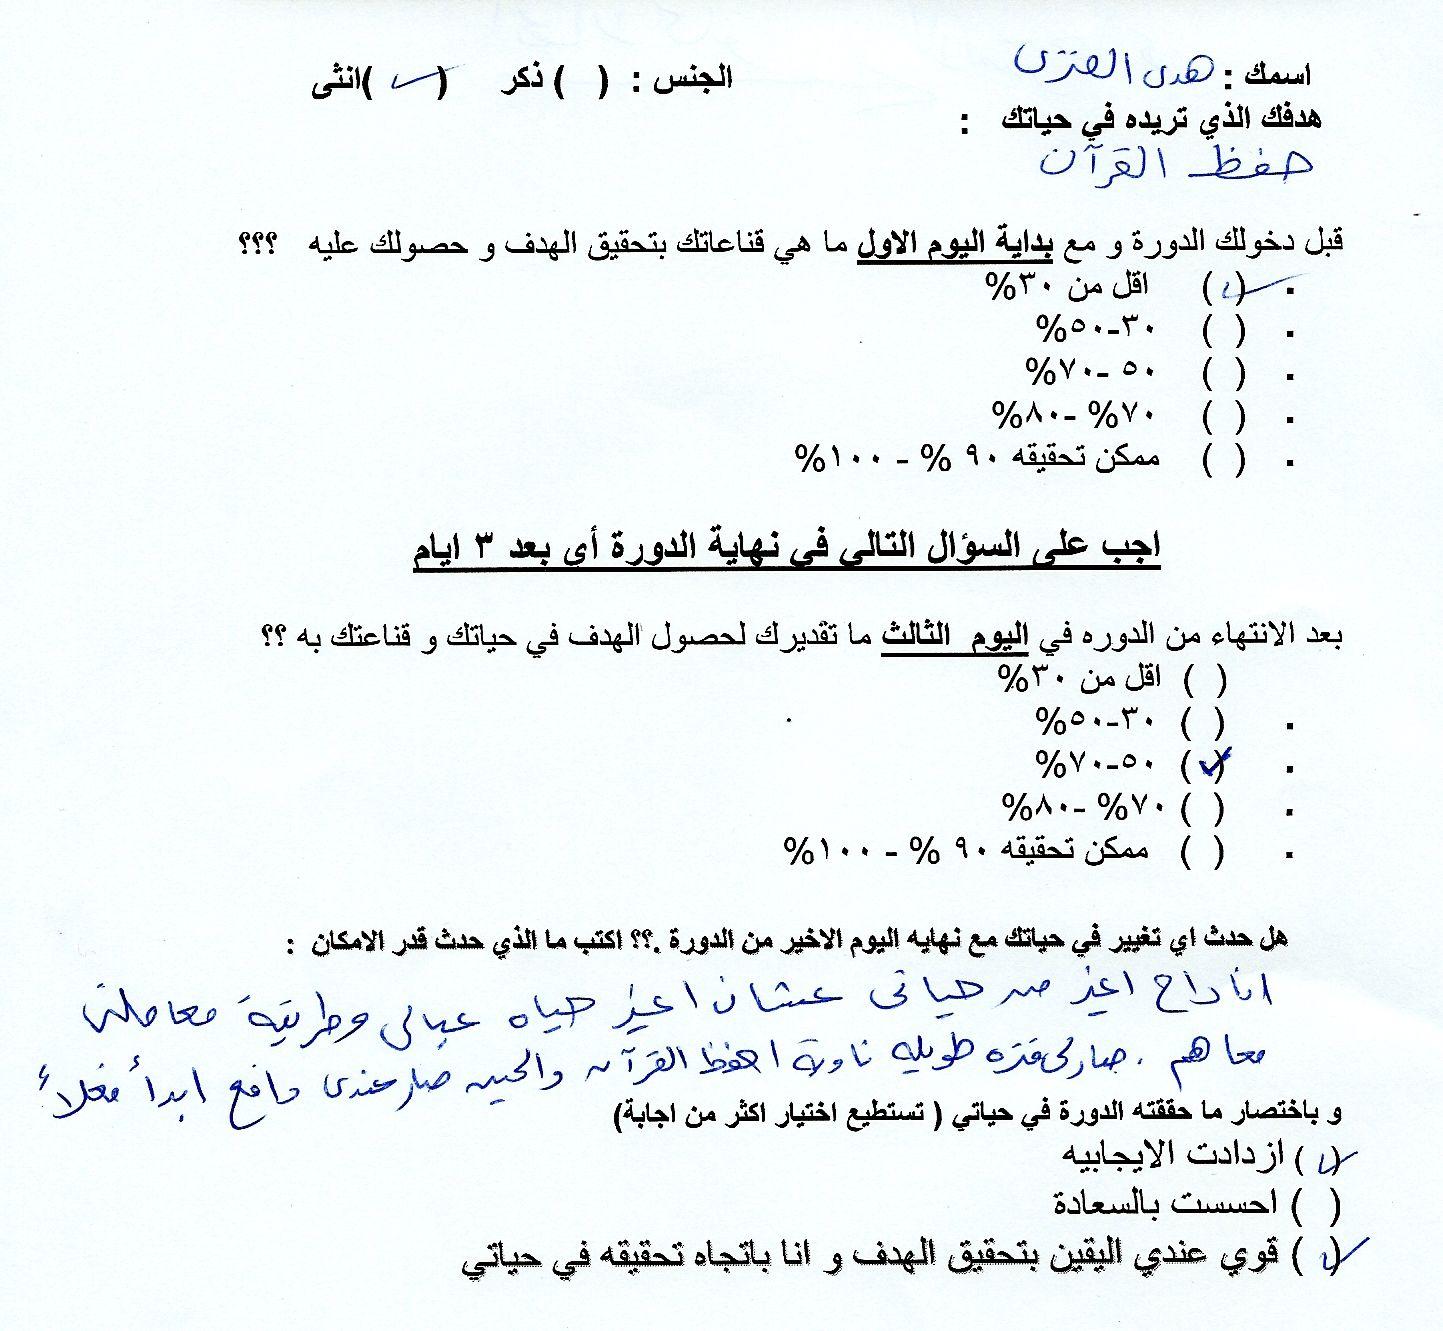 مفتاح قانون الجذب بعد 3 ايام Math Math Equations Equation